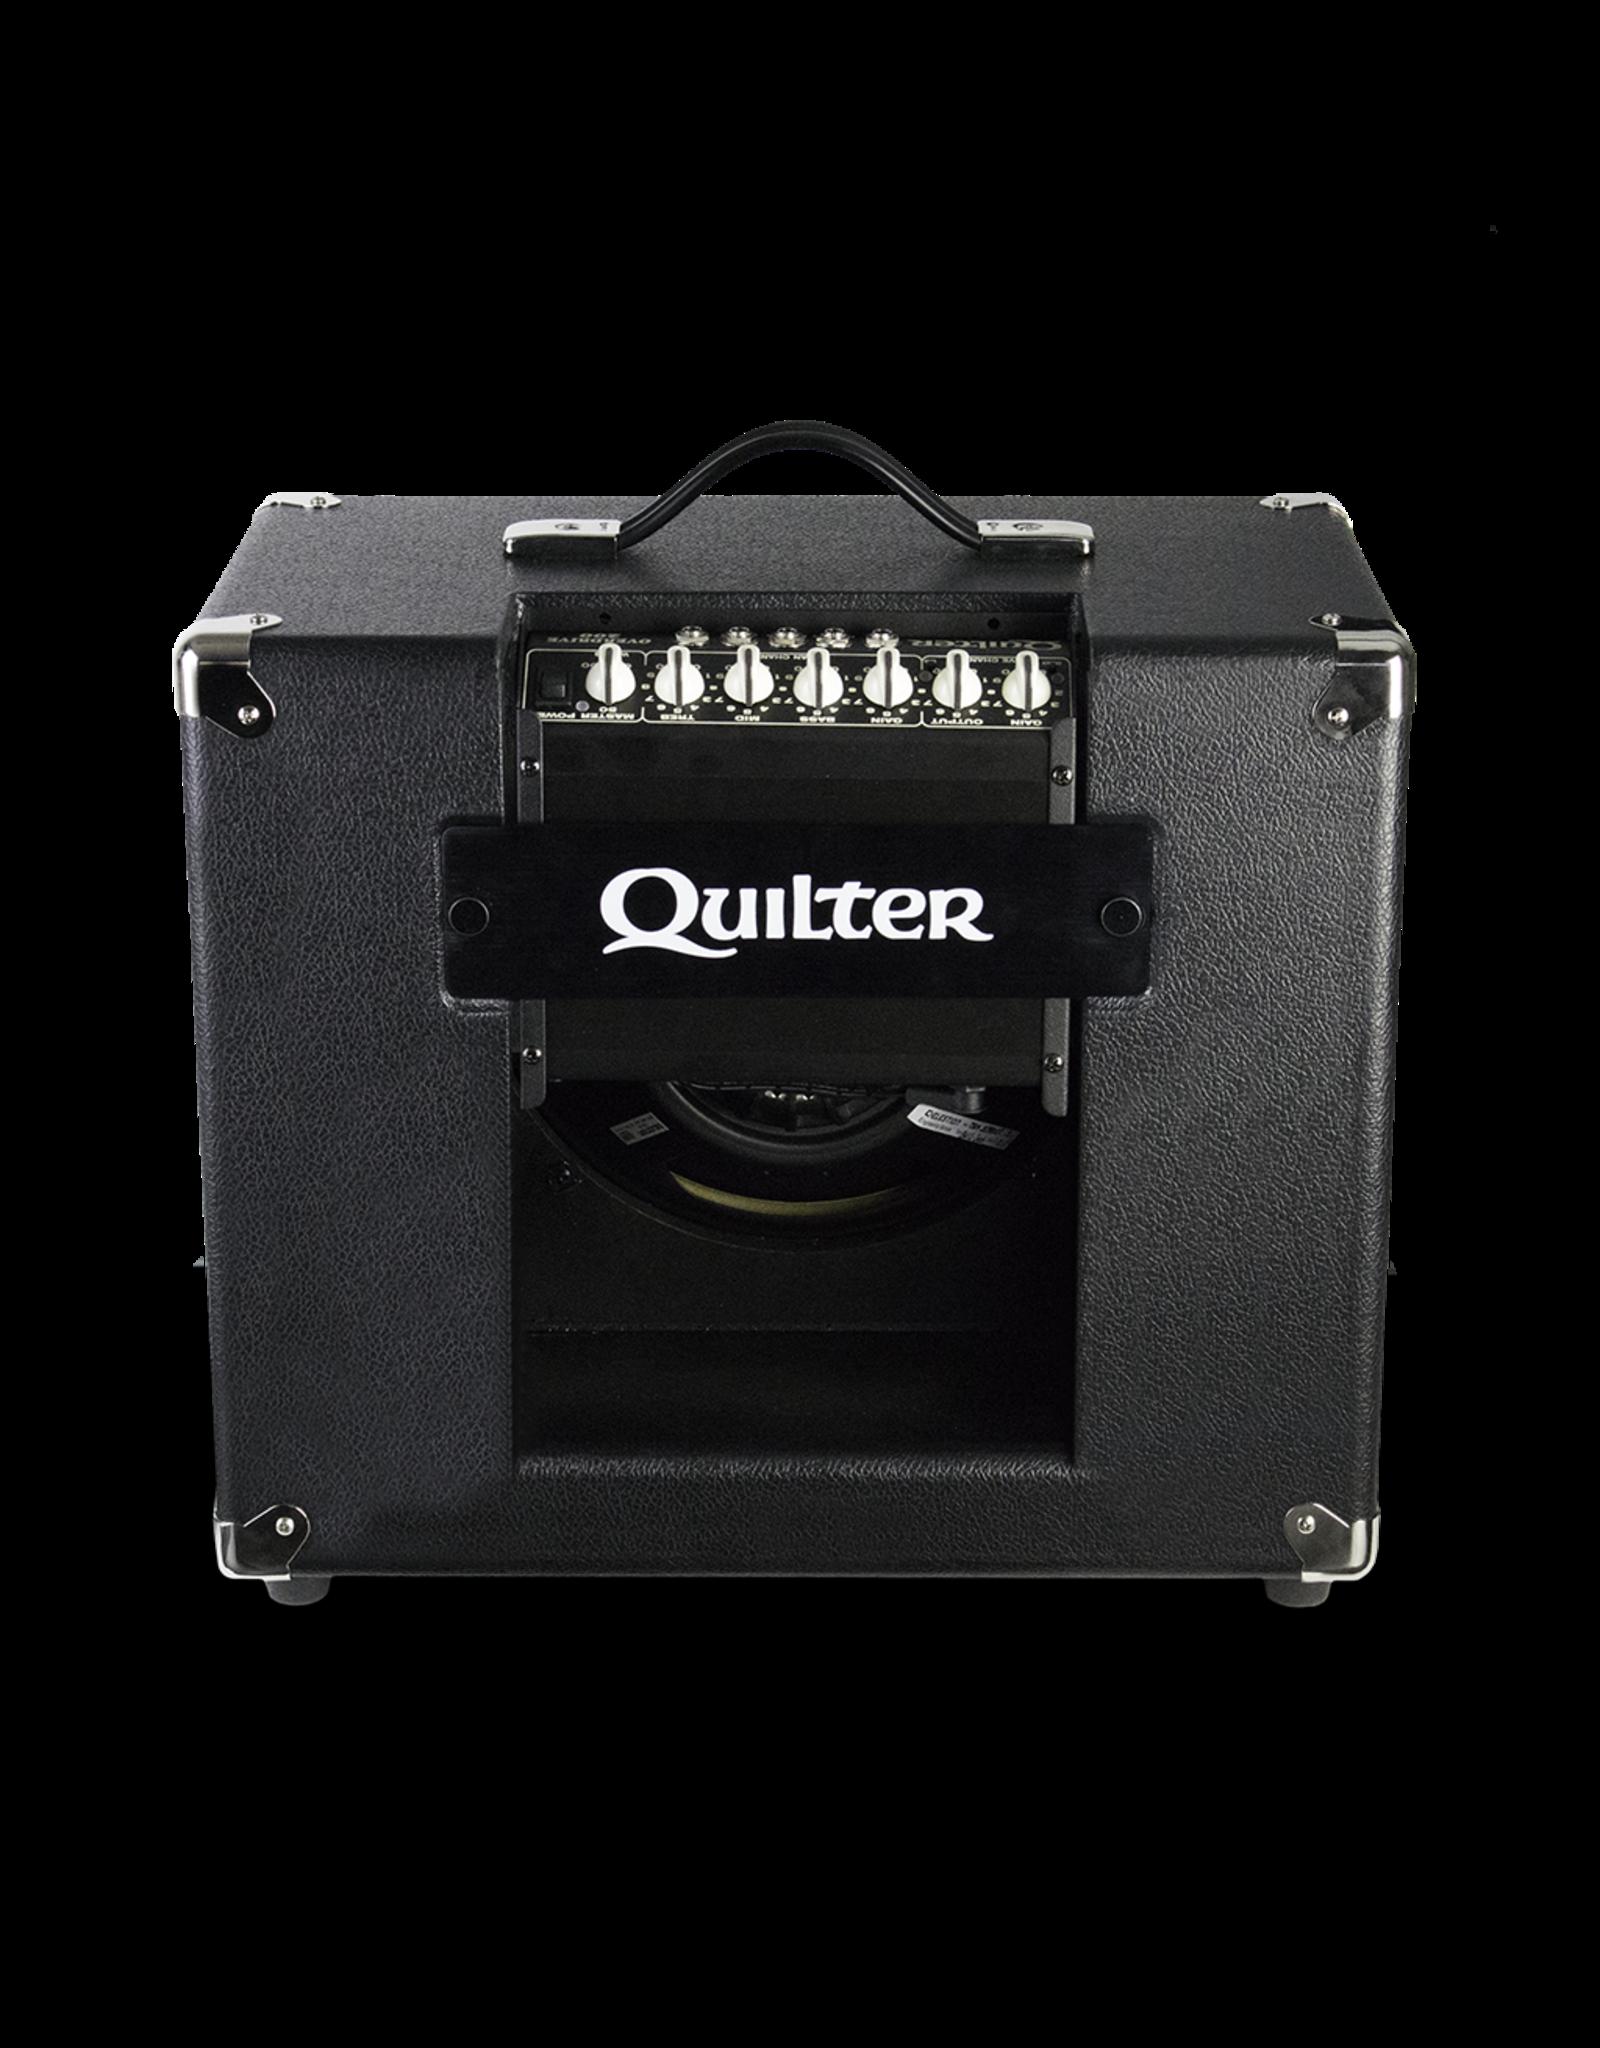 Quilter Quilter Block Dock 12HD